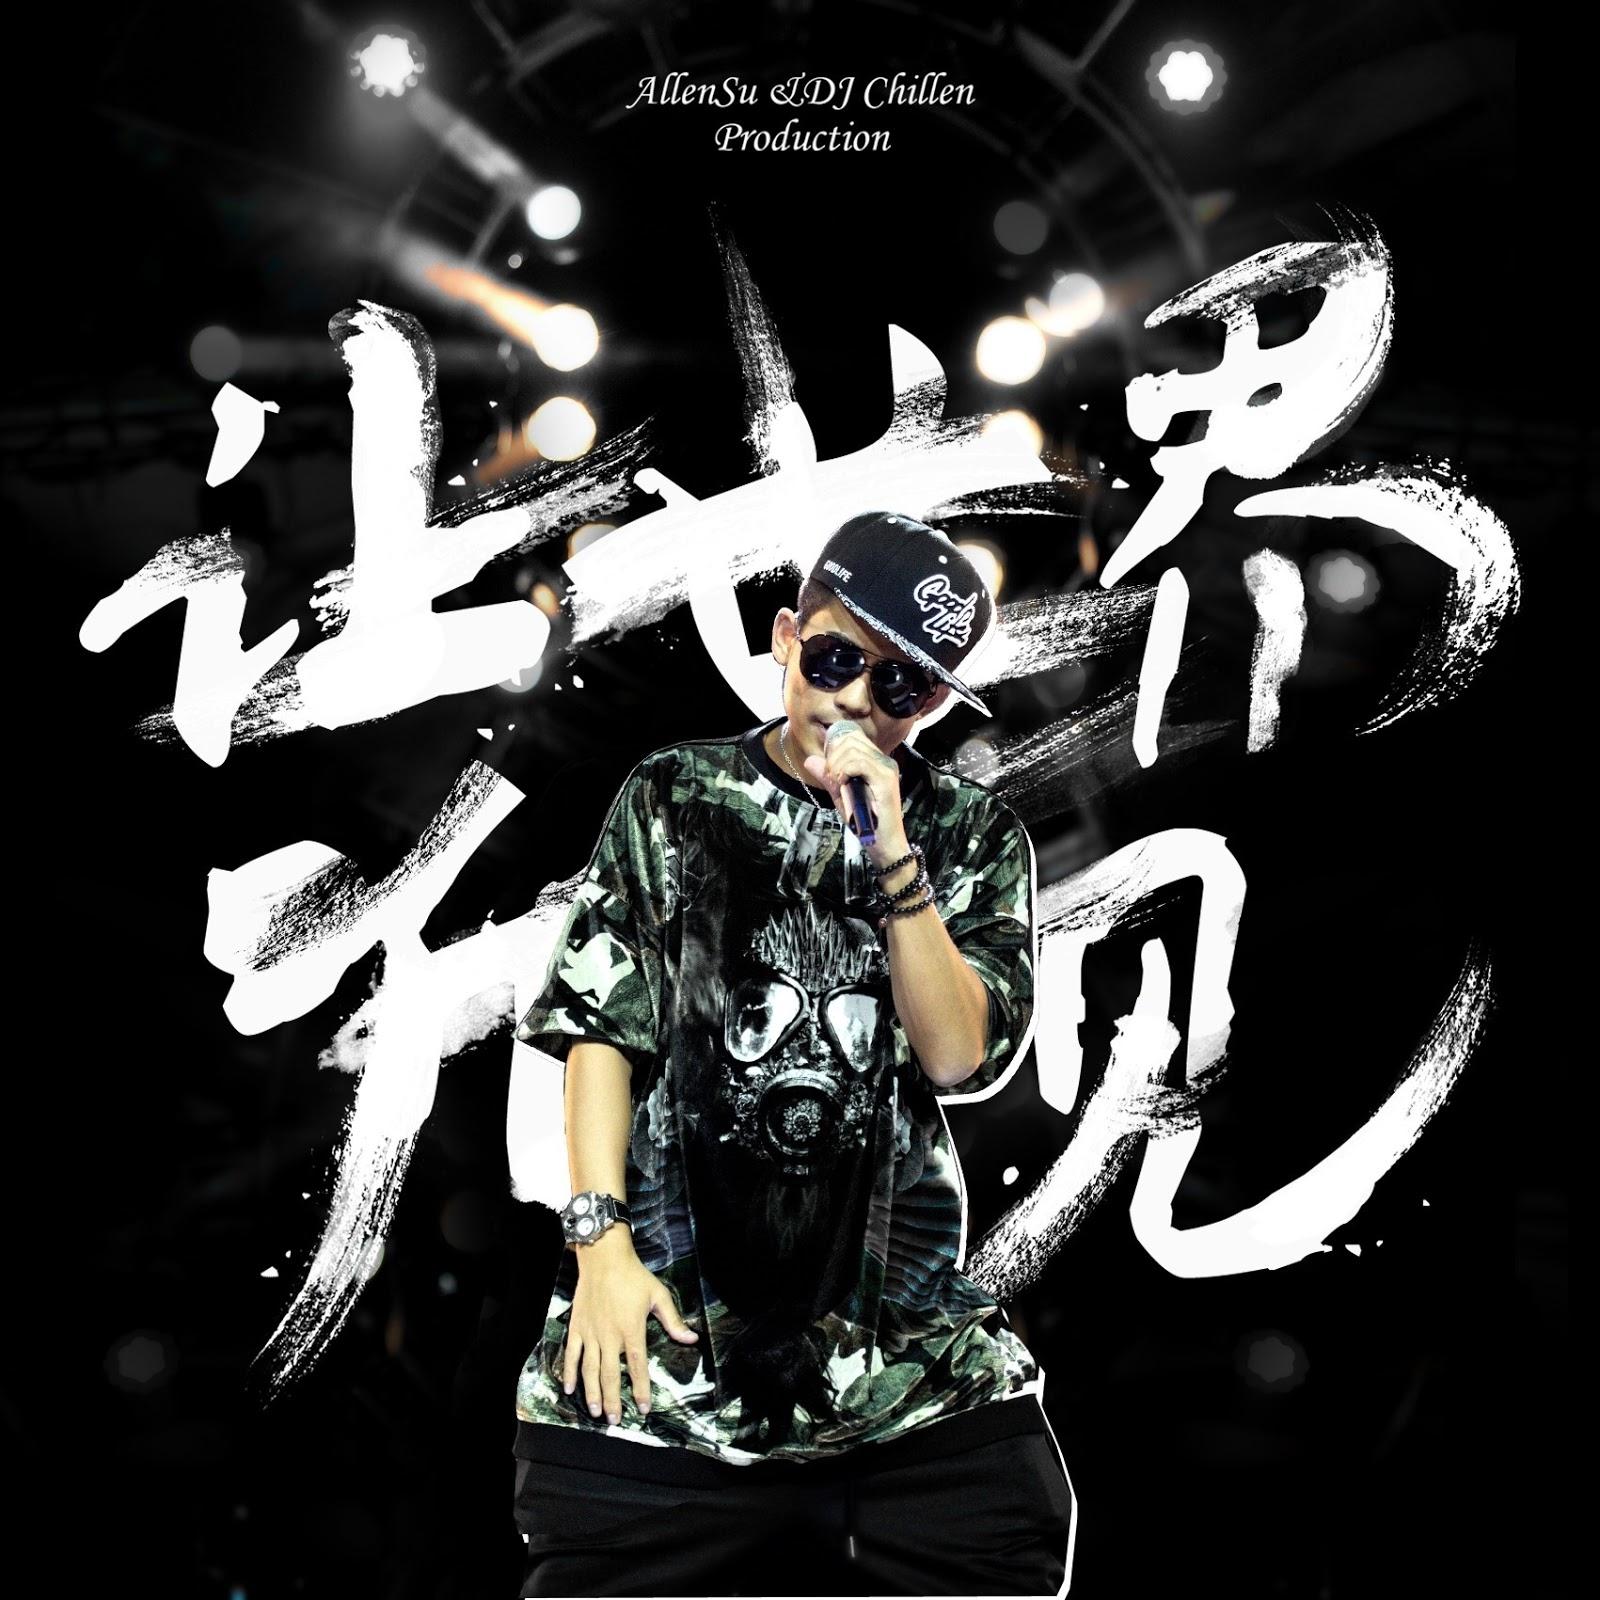 [EP] 讓世界聽見 - 蘇醒 Allen Su